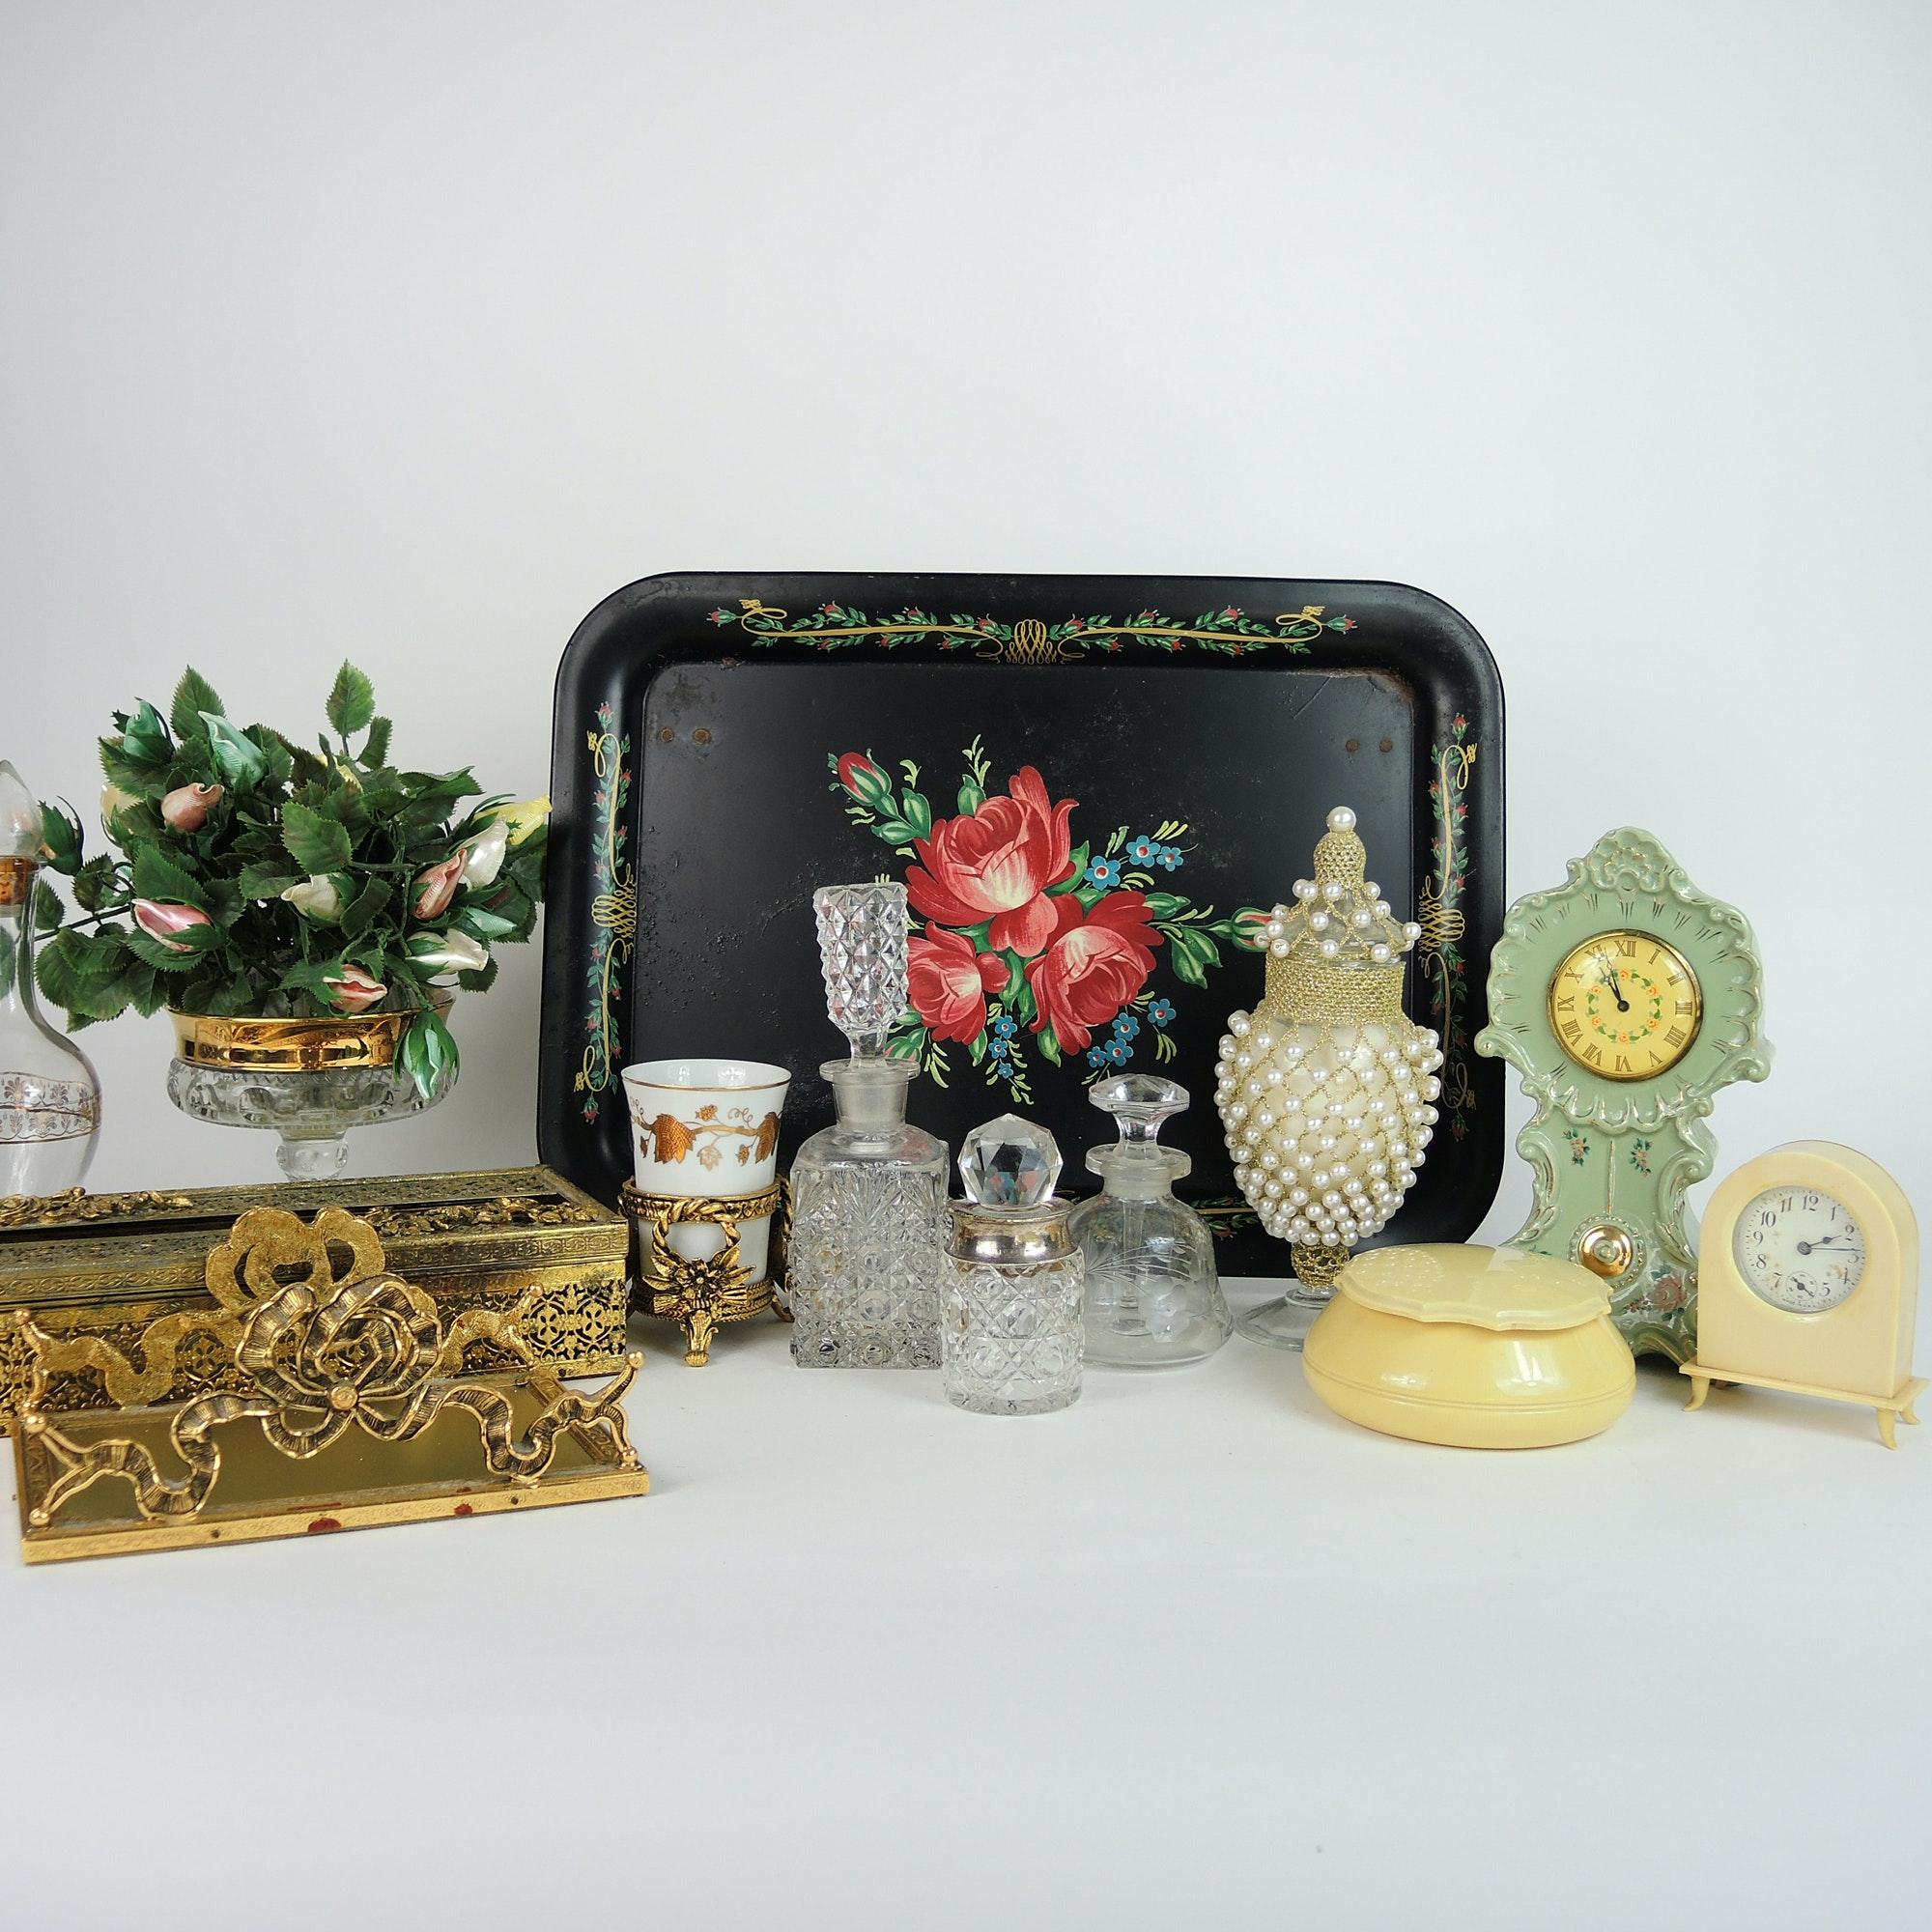 Bath Vanity Decor, Pierced Accessories, Bottles, Clocks and More